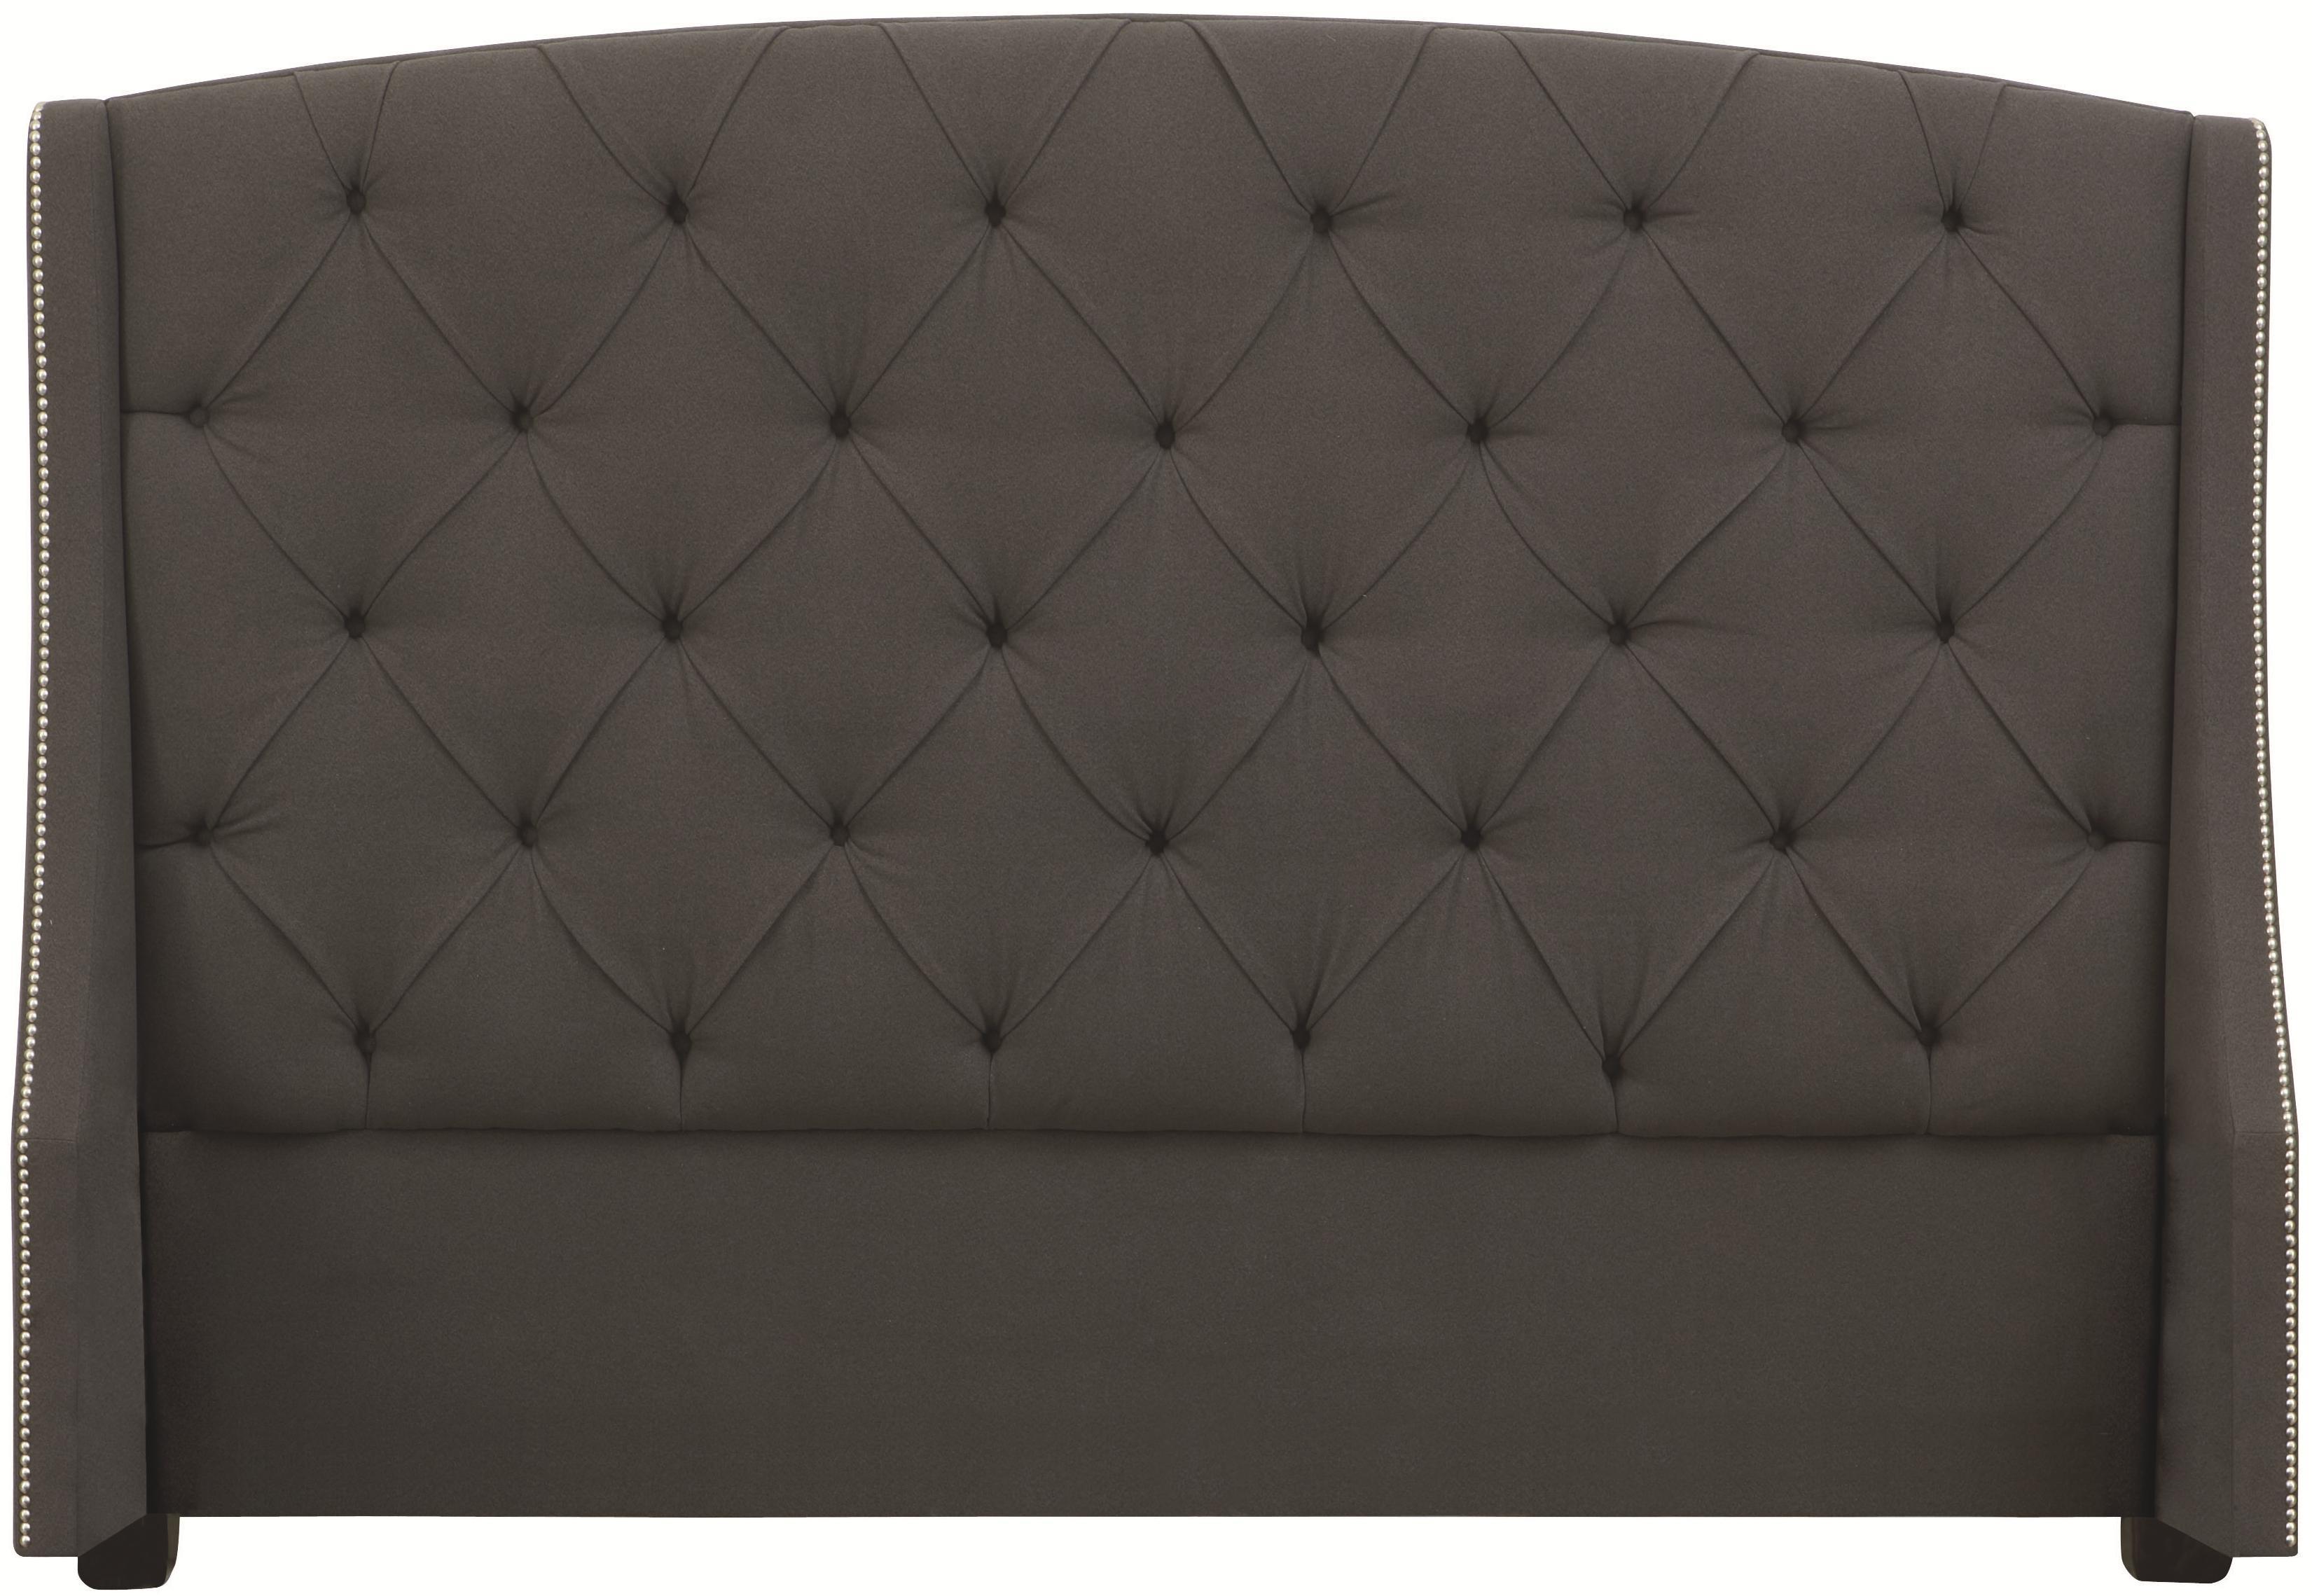 Bernhardt Interiors - Beds King Jordan Button-Tufted Wing Headboard - Item Number: 758-H66H